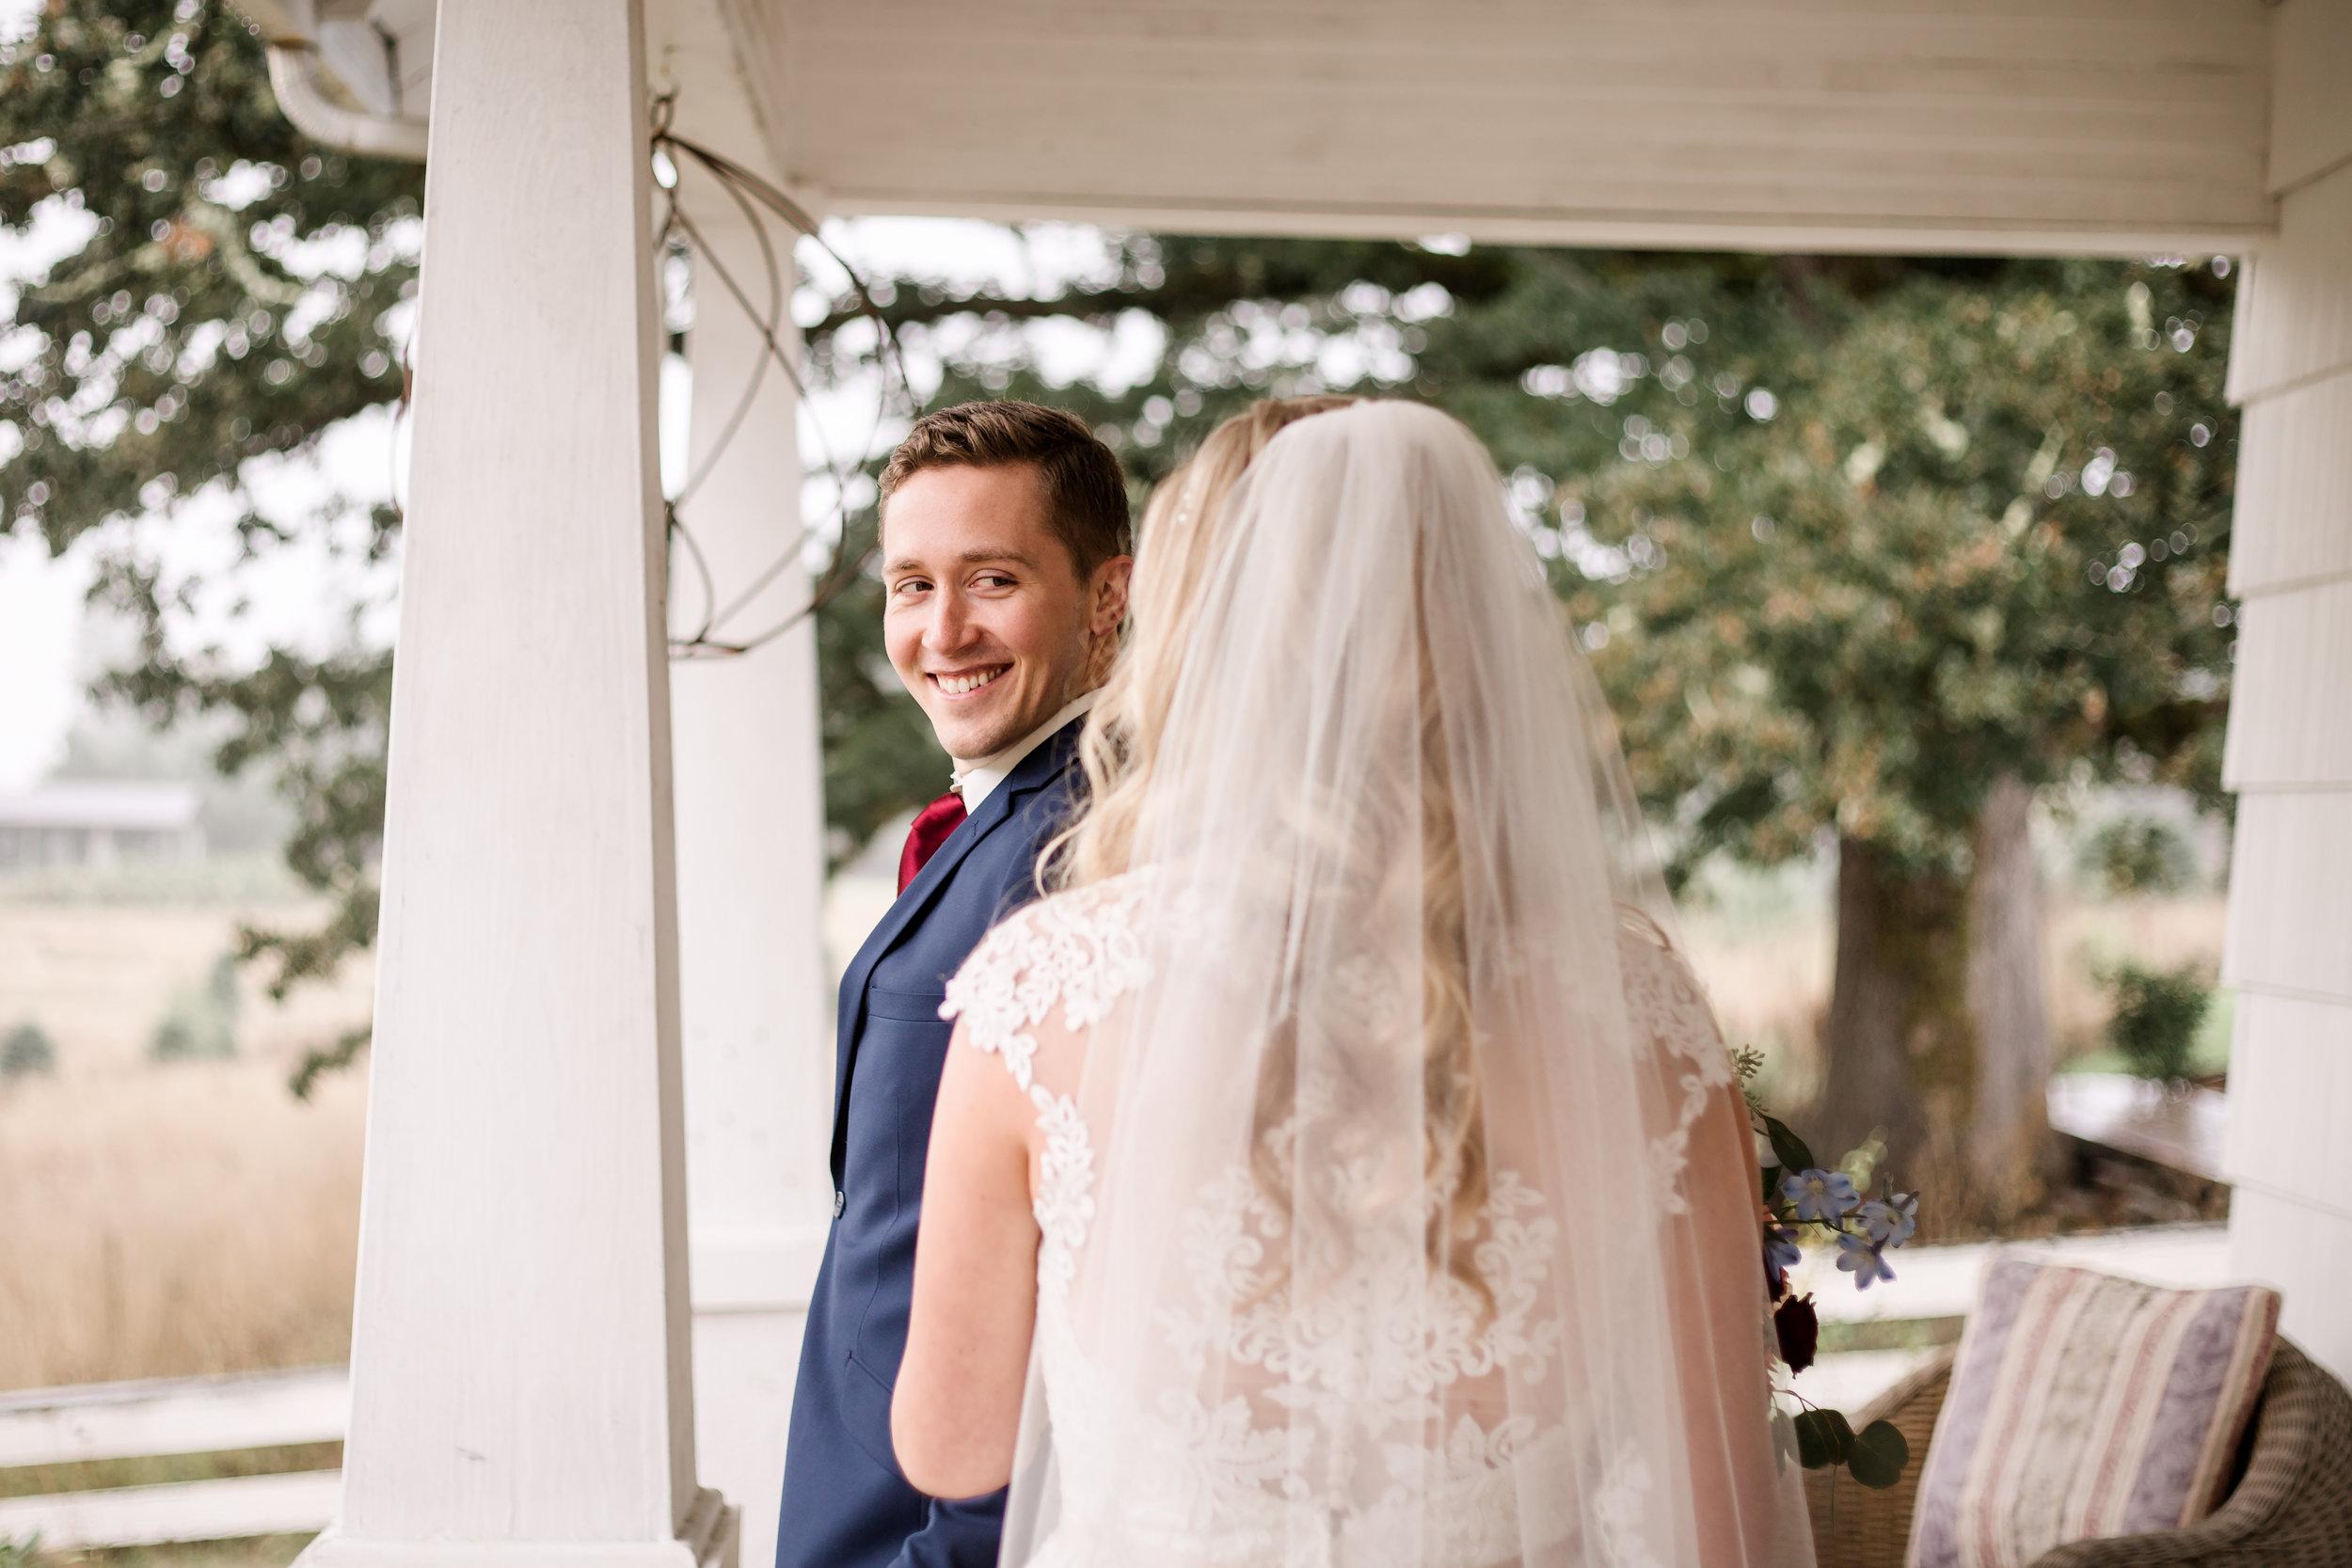 Bridalbliss.com | Portland  Seattle Wedding Planner | Oregon Washington Event Planning and Design |  Santa Ana Photography